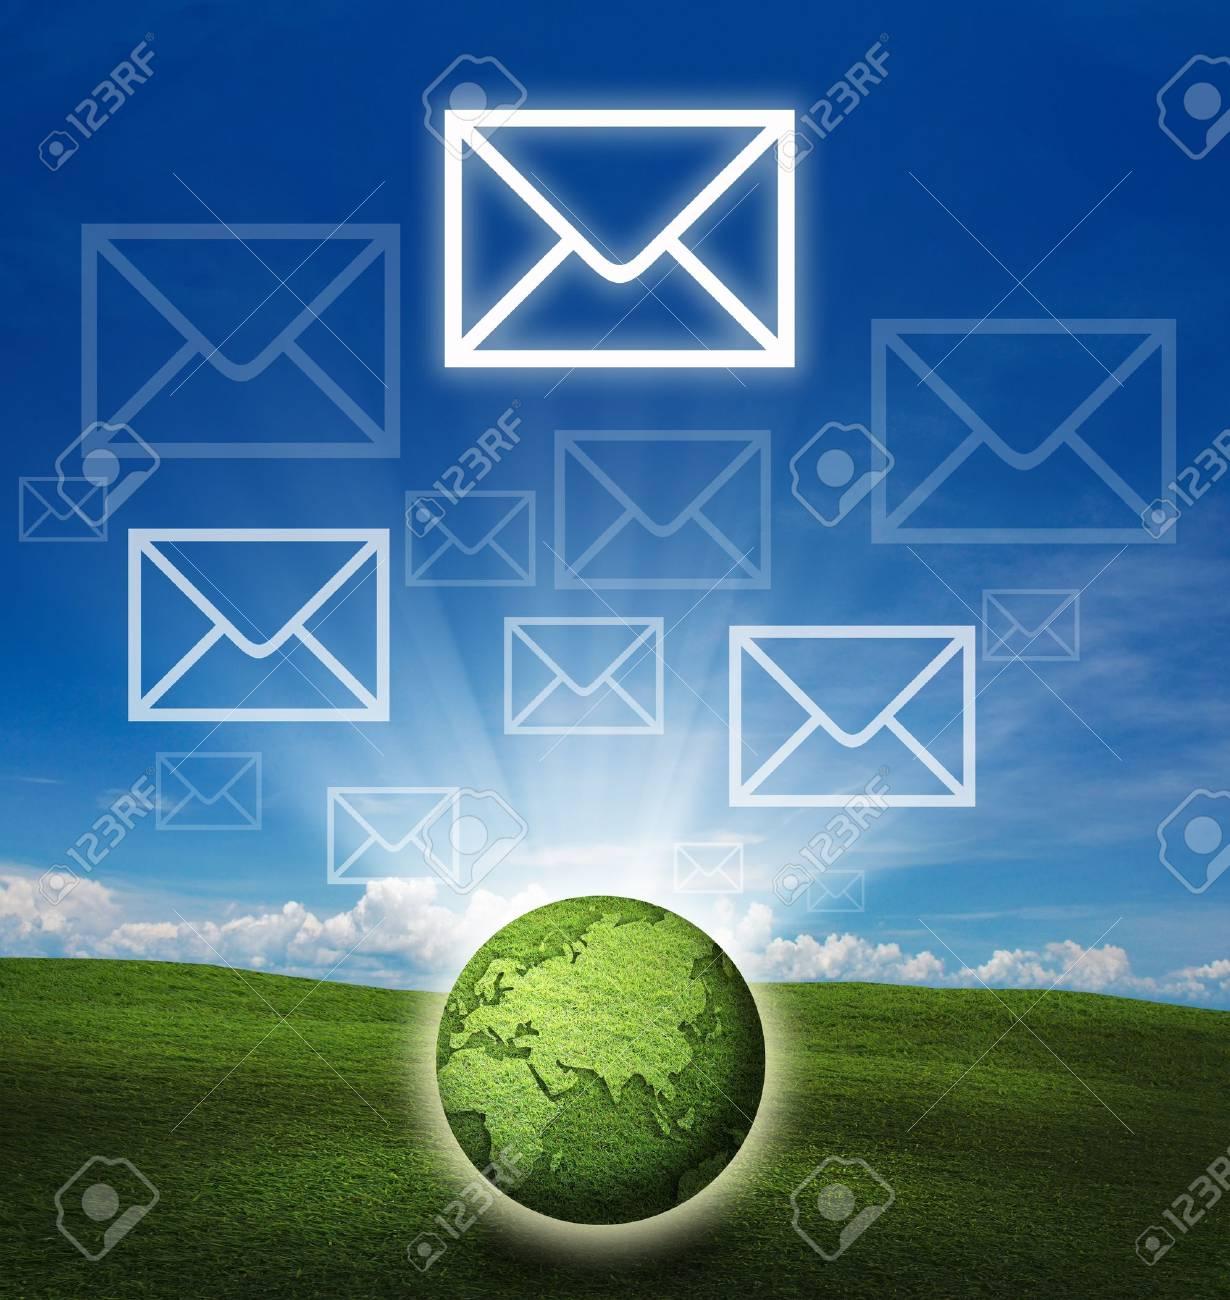 communication idea over attractive background. Stock Photo - 10213387